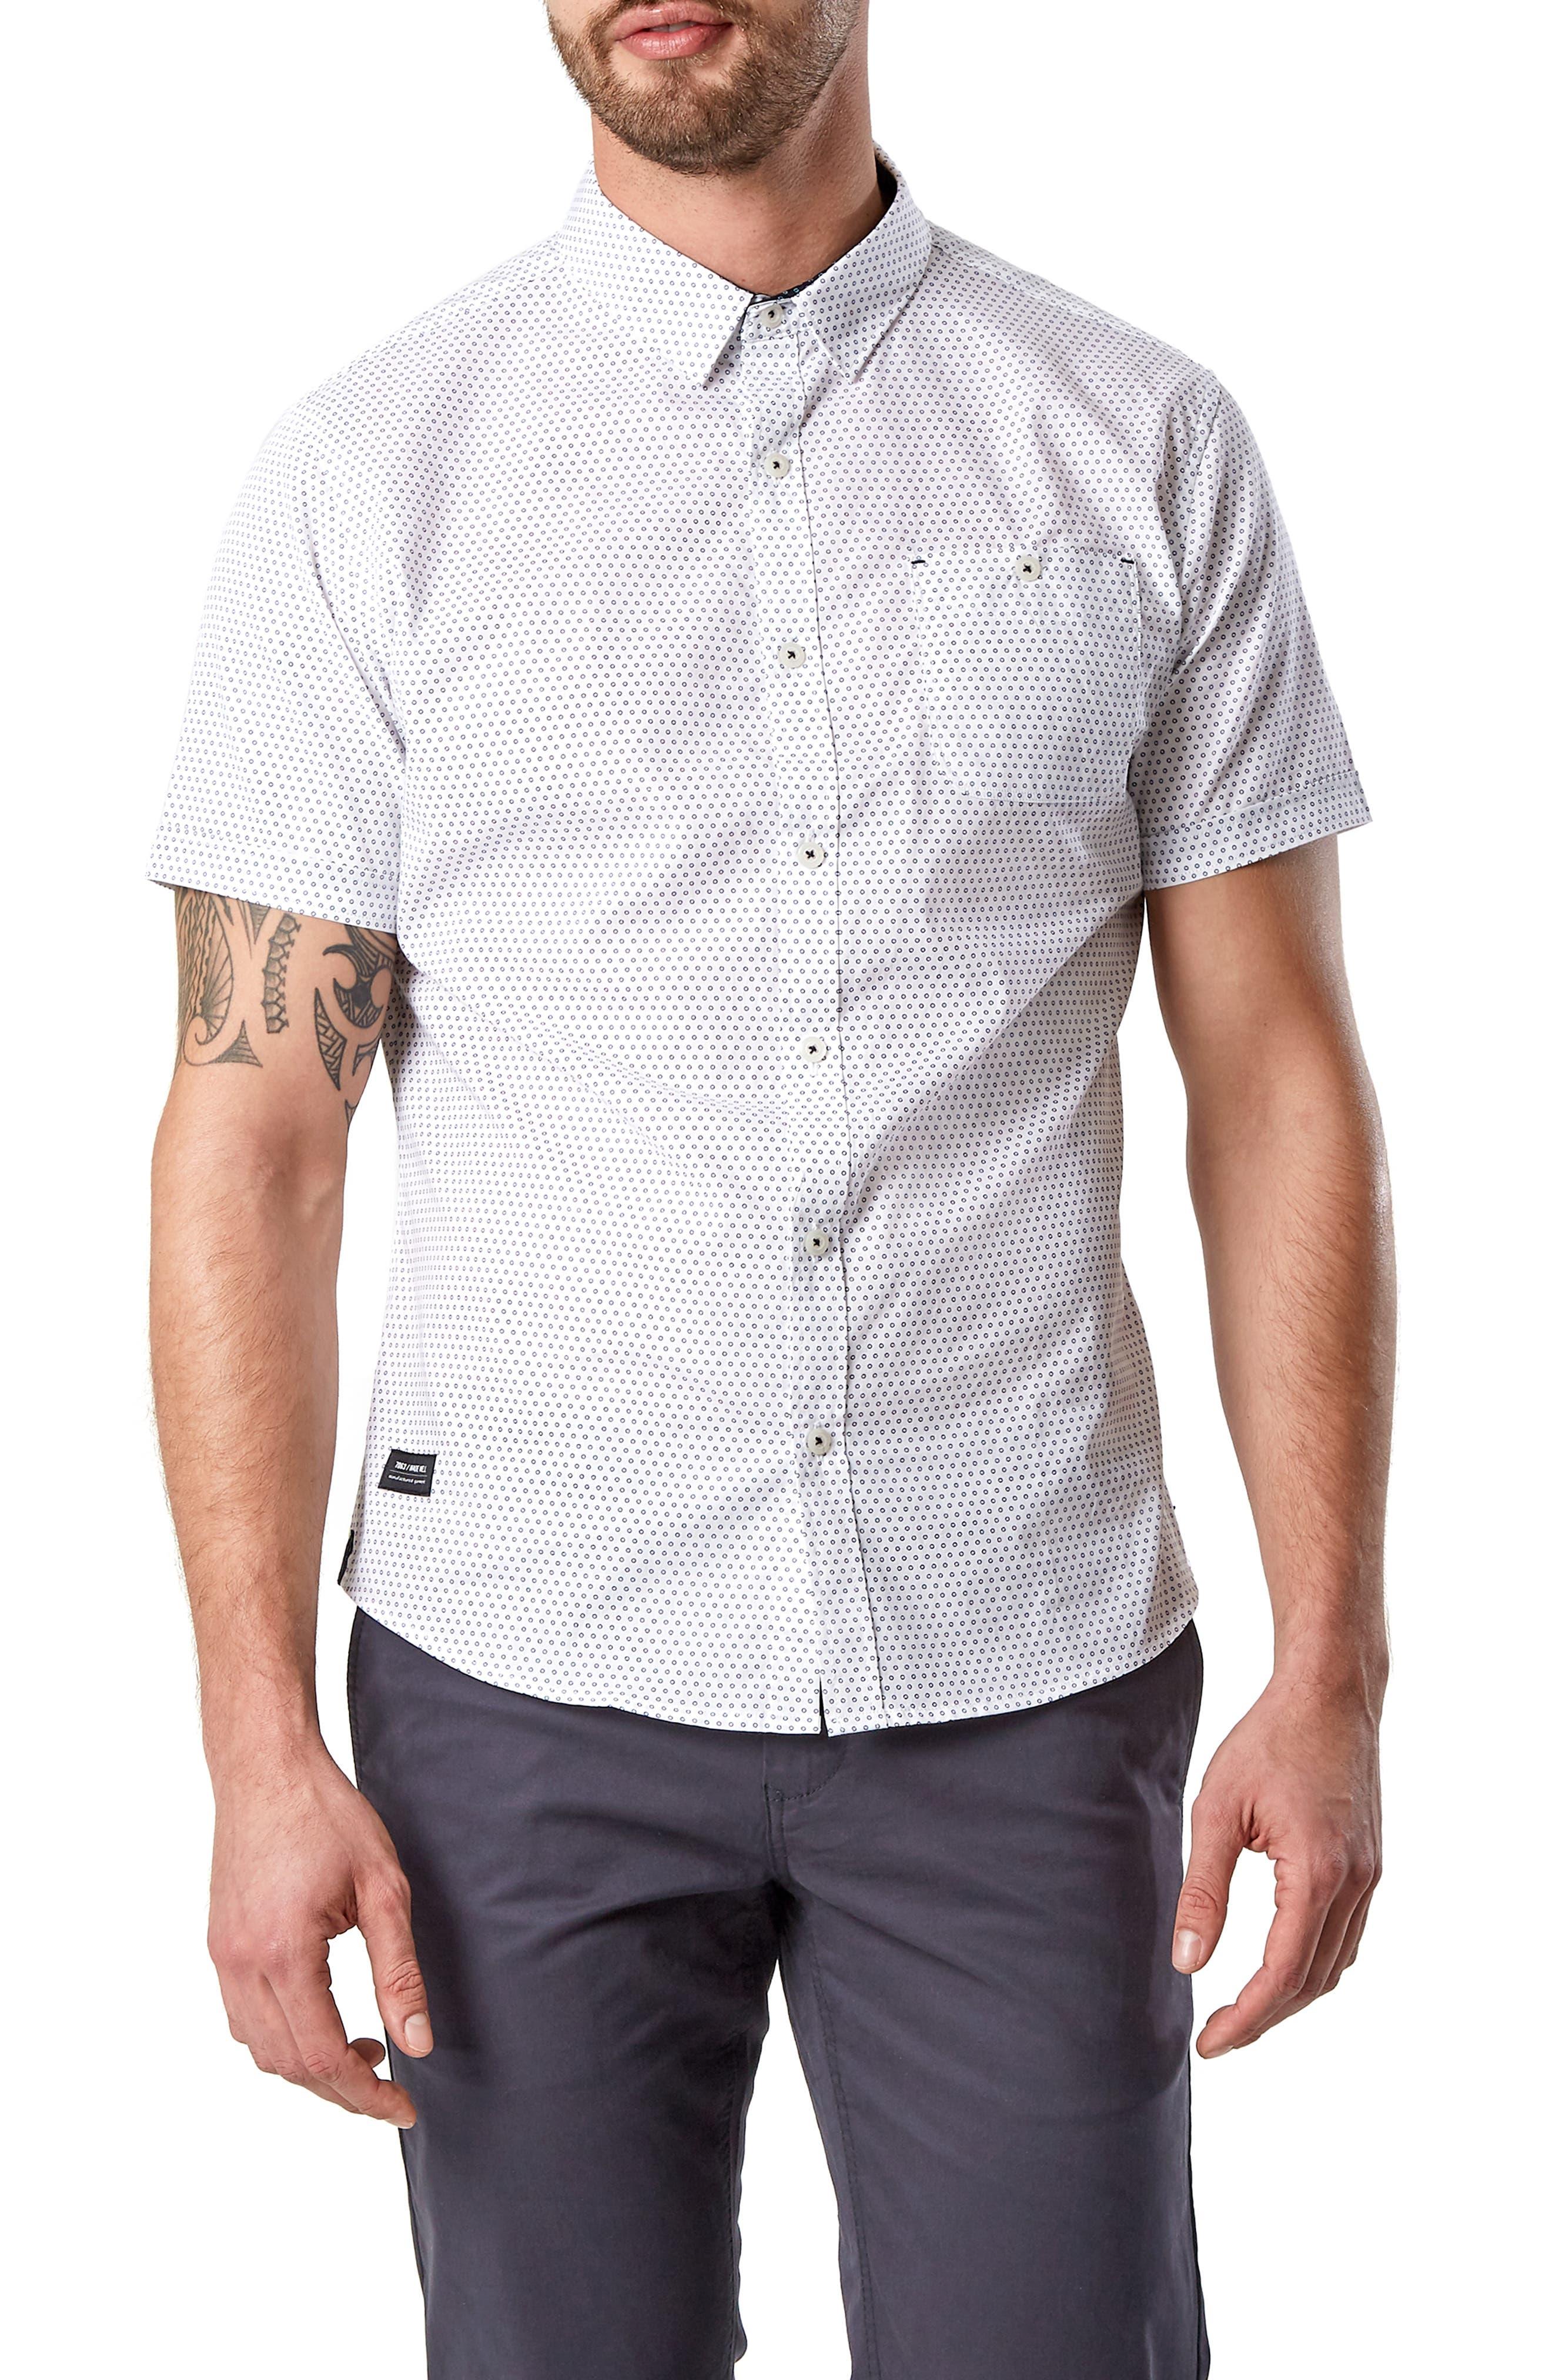 Suavecito Slim Fit Sport Shirt, Main, color, WHITE